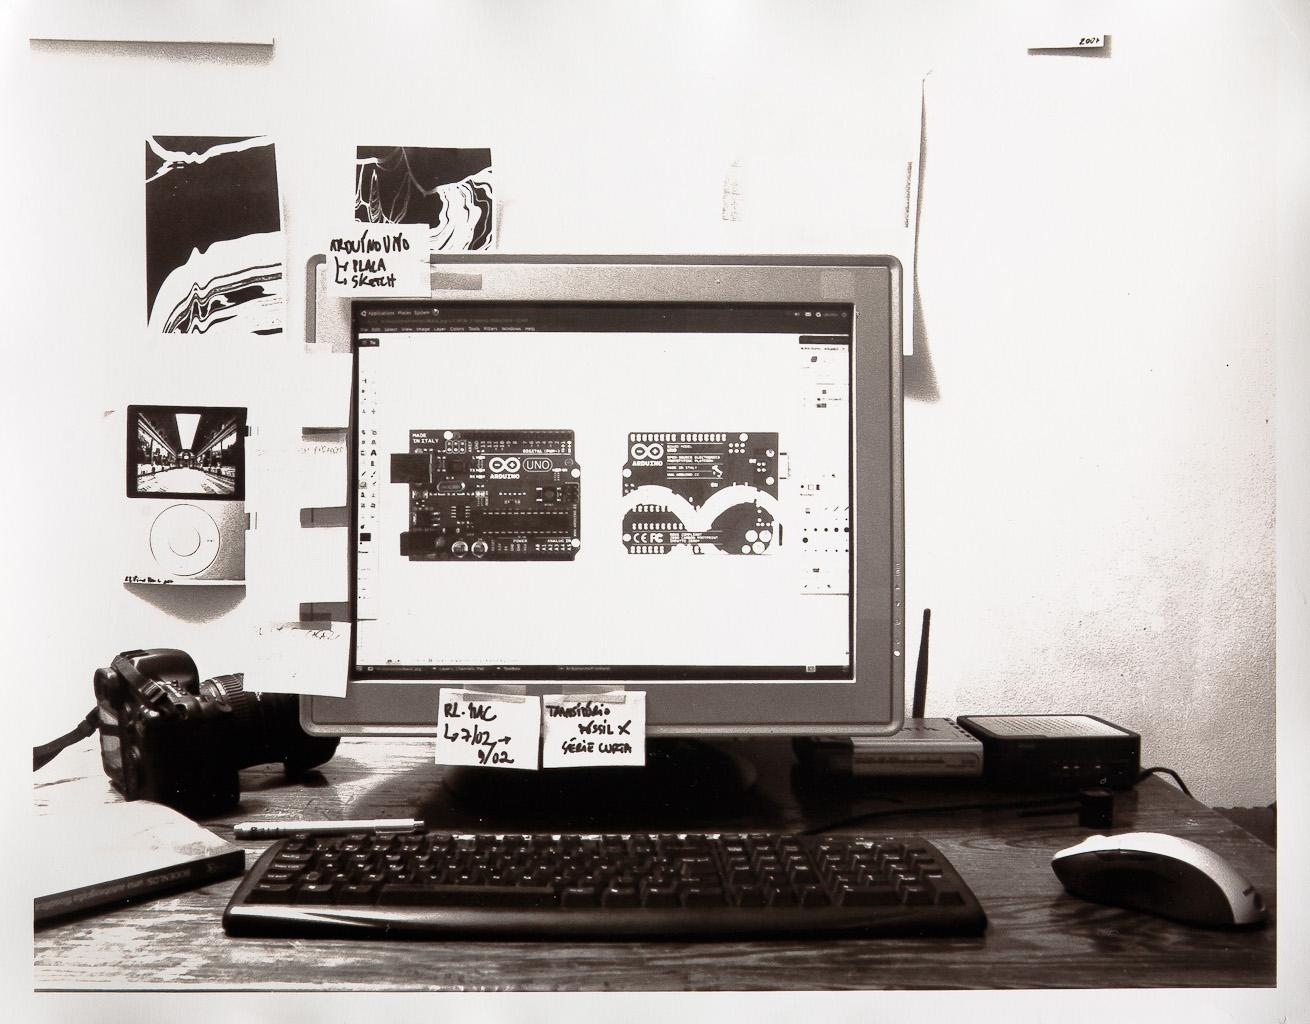 Linux Station and Arduino Uno (with Ronaldo Lemos)